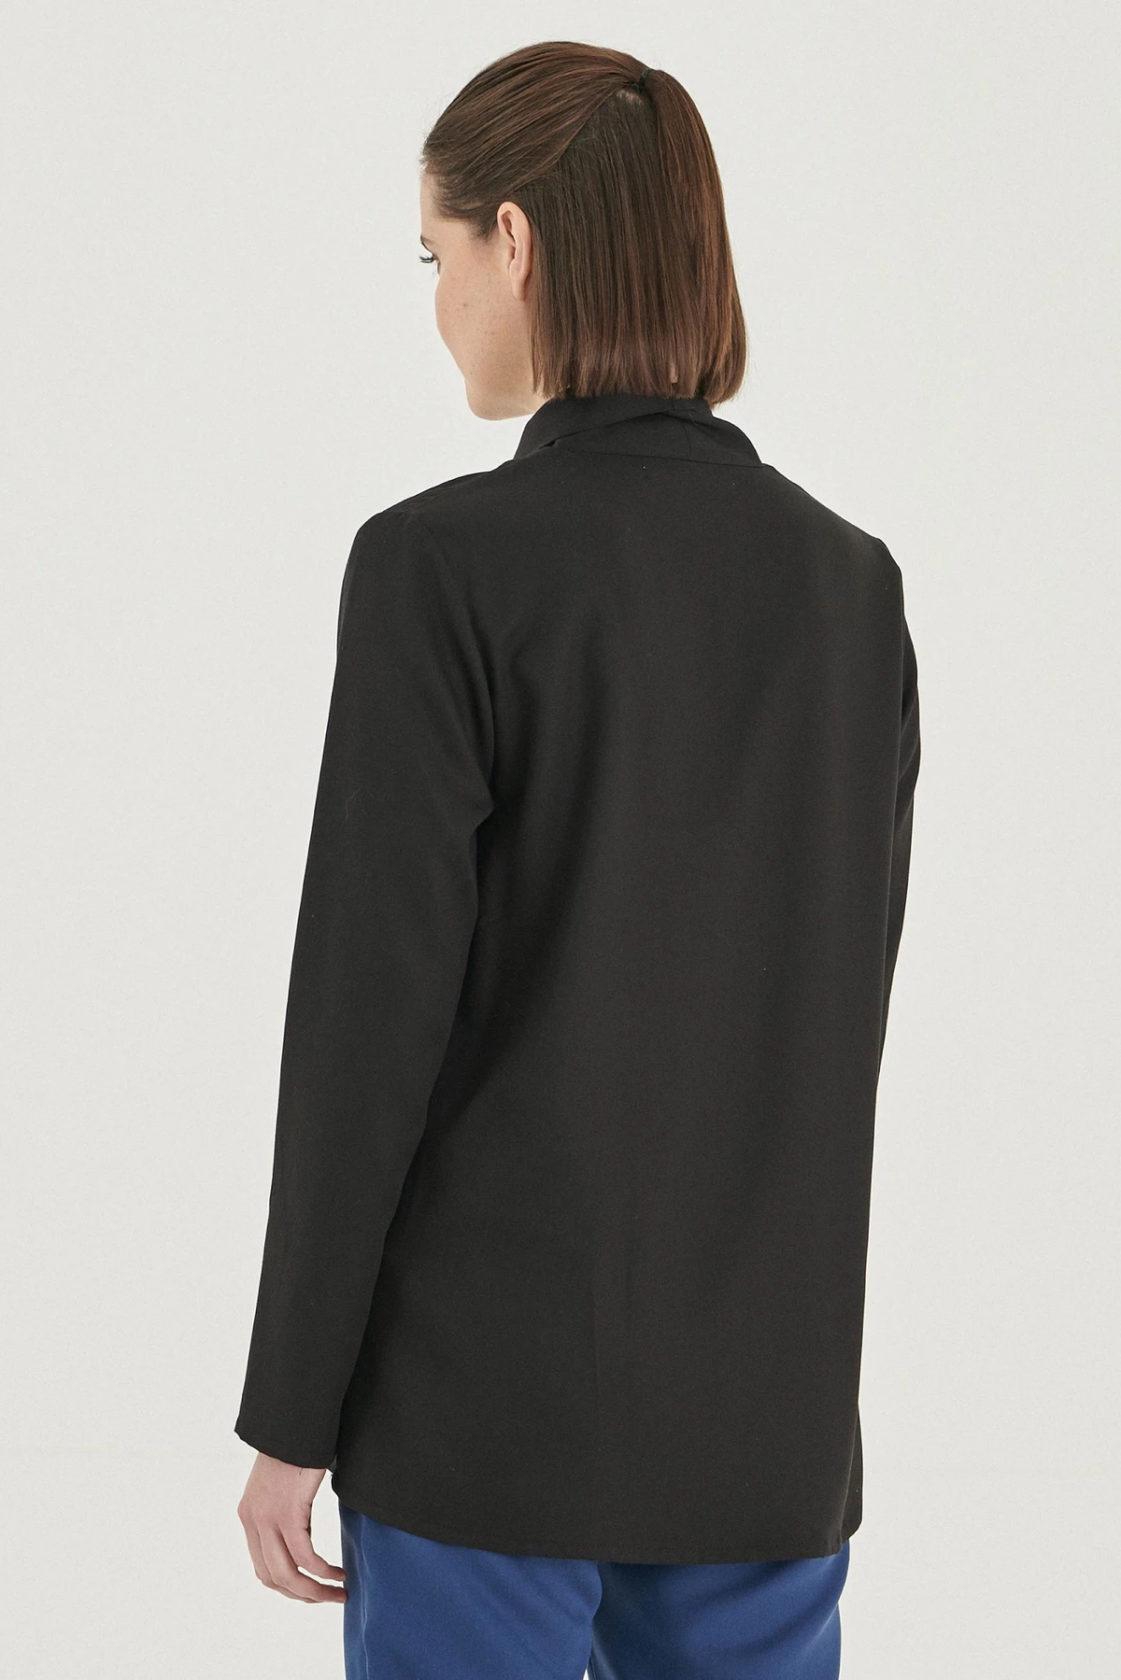 Roberta Organic Fashion Organication Bluse Black 3